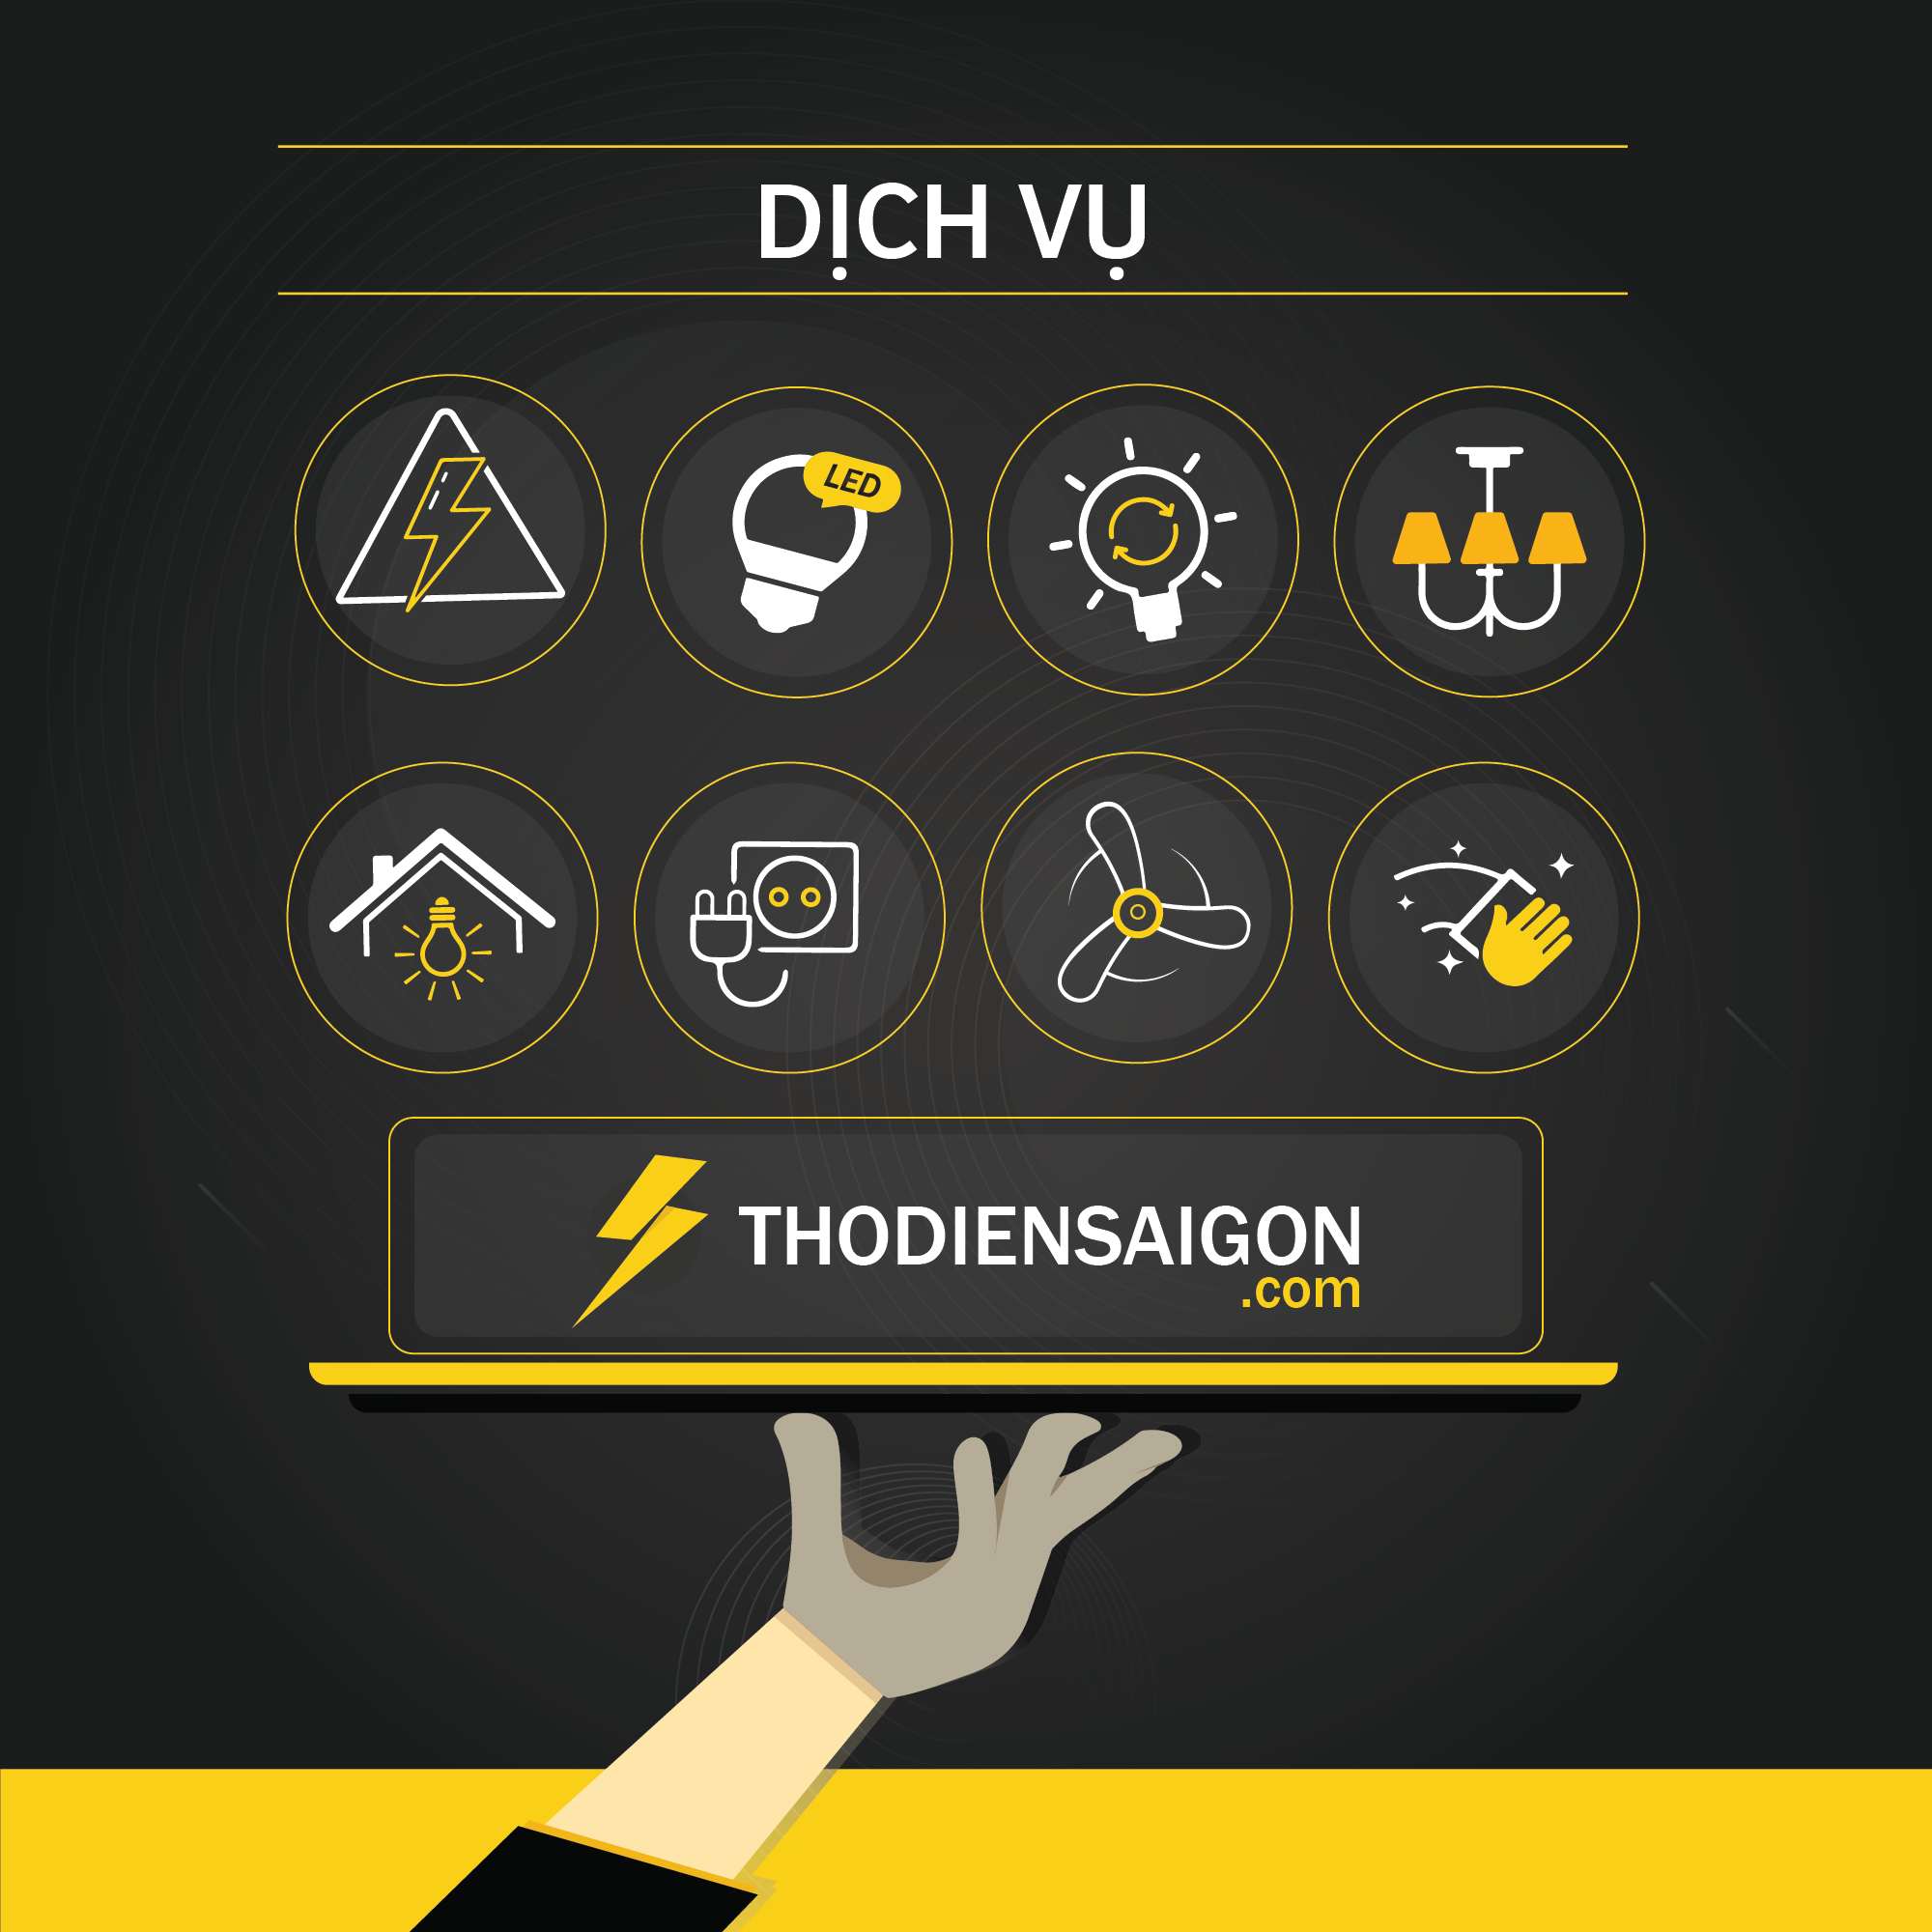 Nhóm sản phẩm thodiensaigon.com